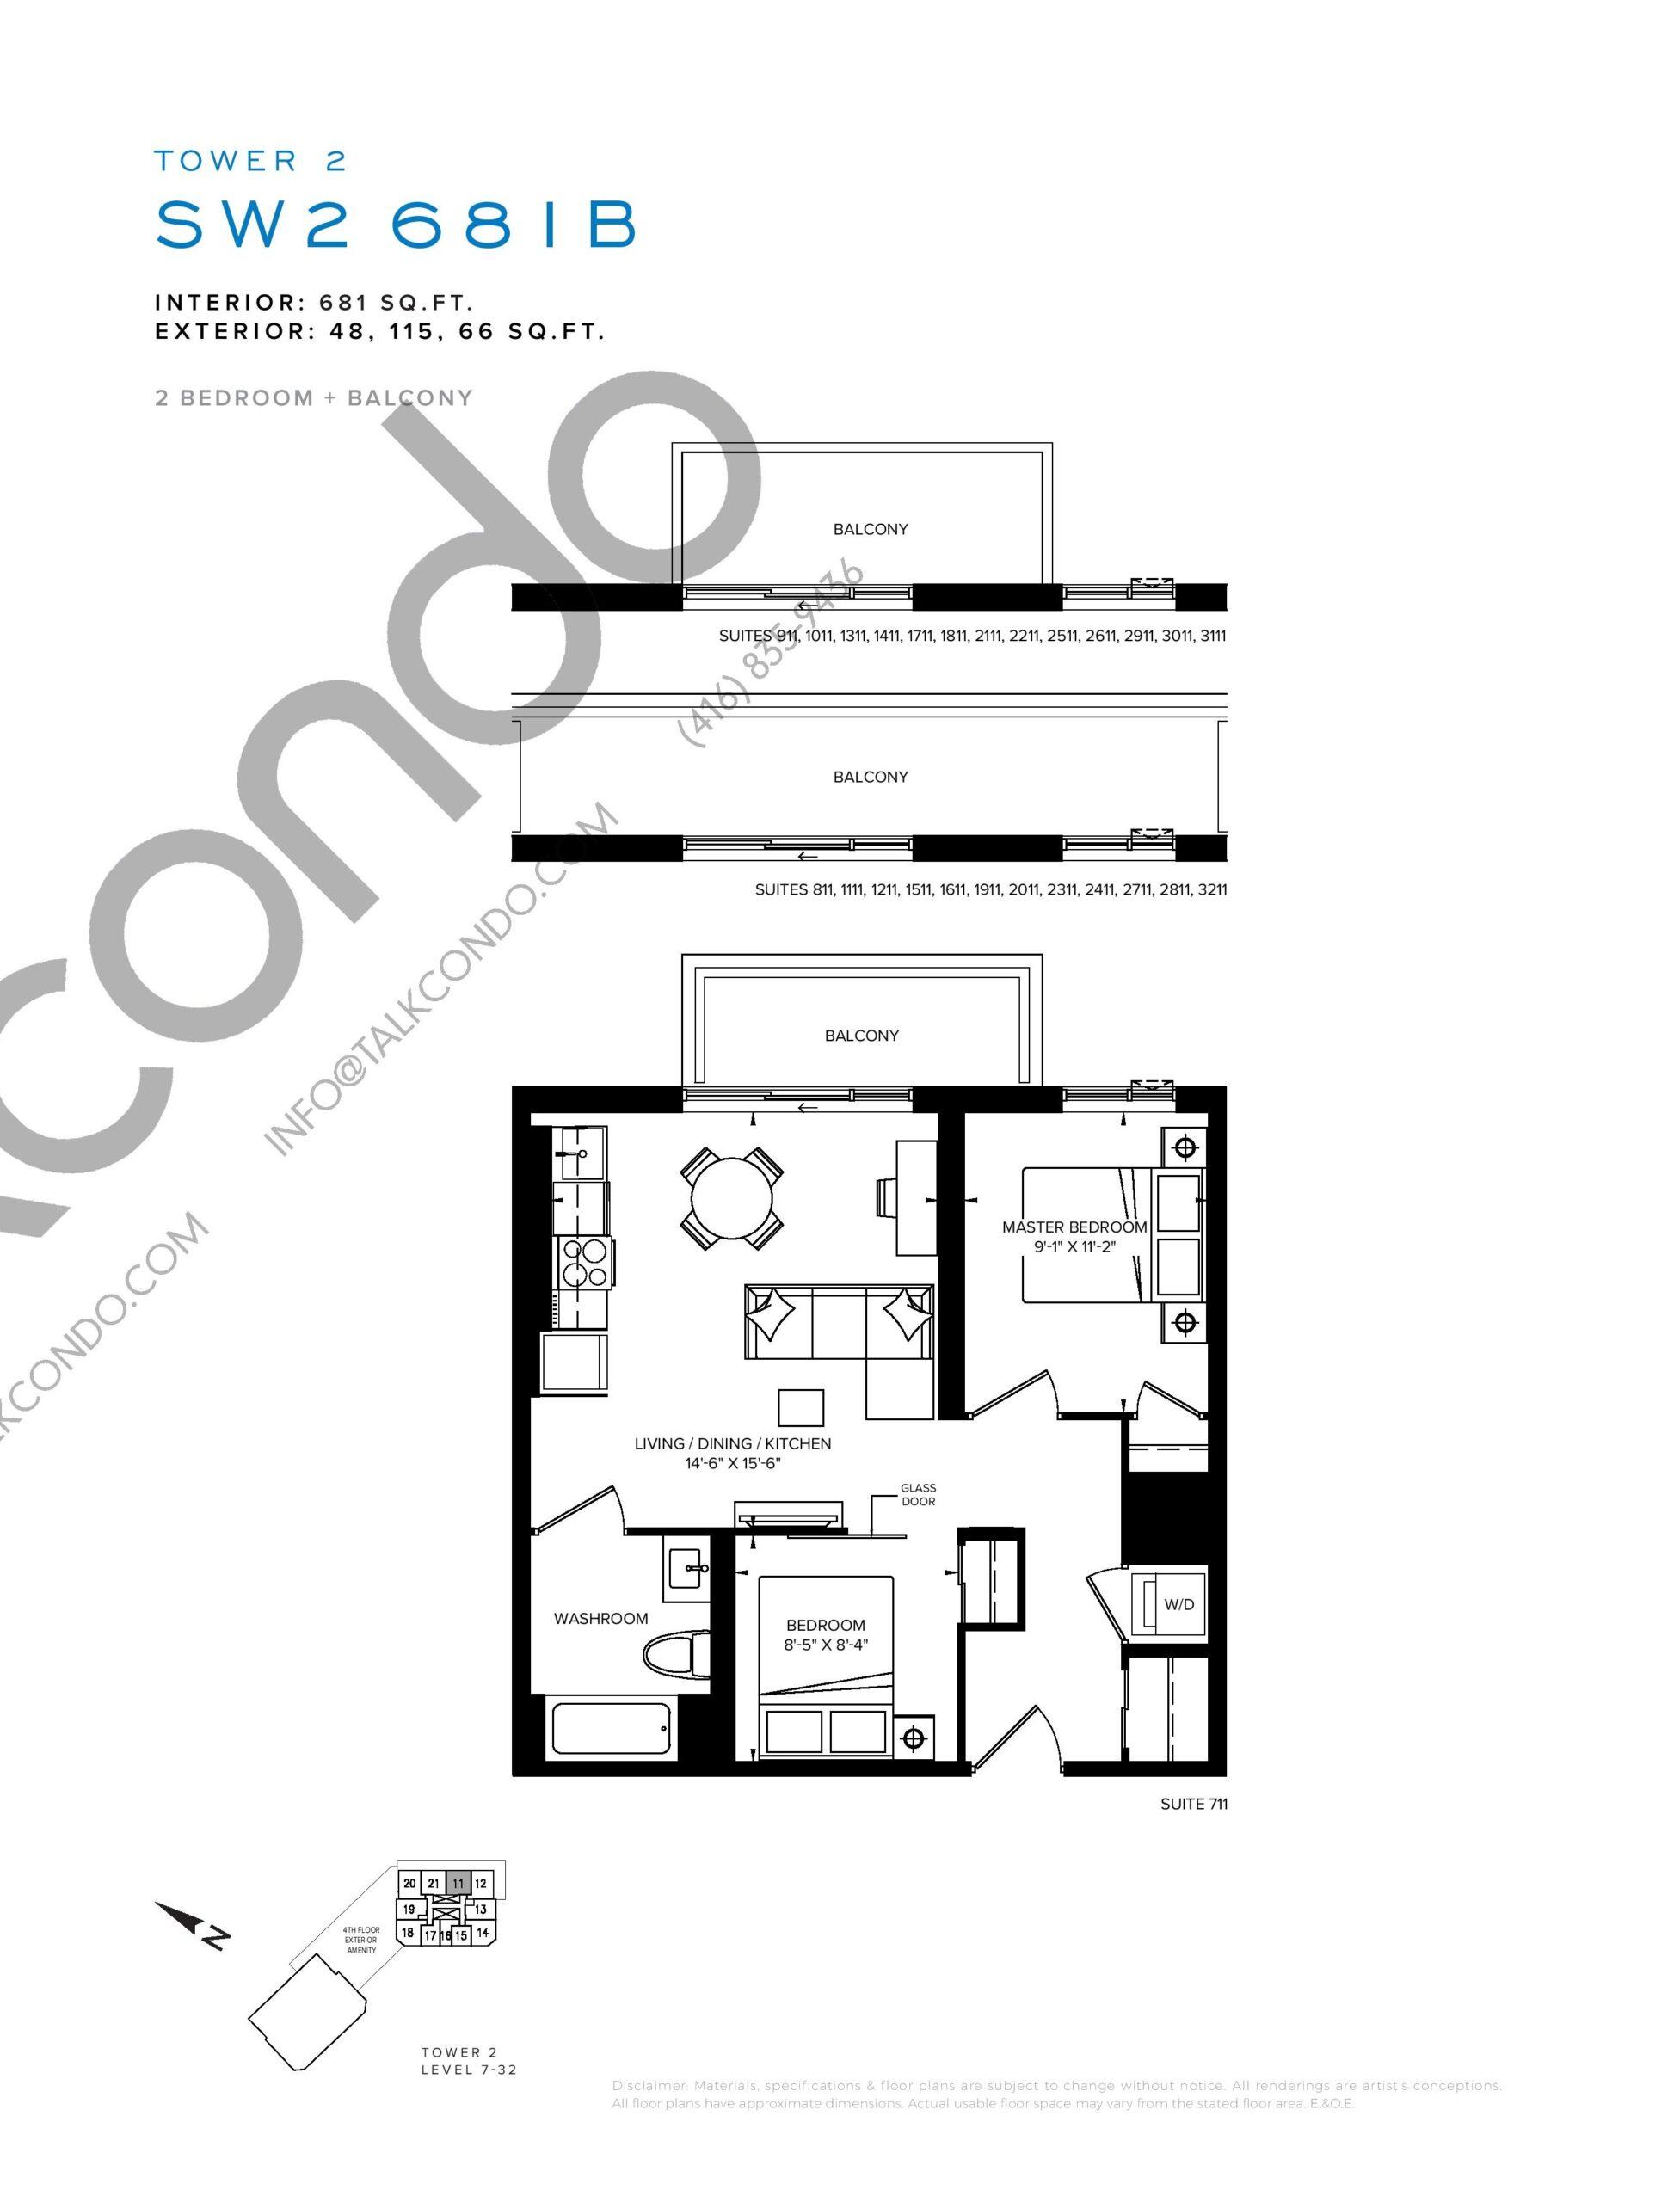 SW2 681B Floor Plan at SXSW Tower 2 Condos (SXSW2) - 681 sq.ft